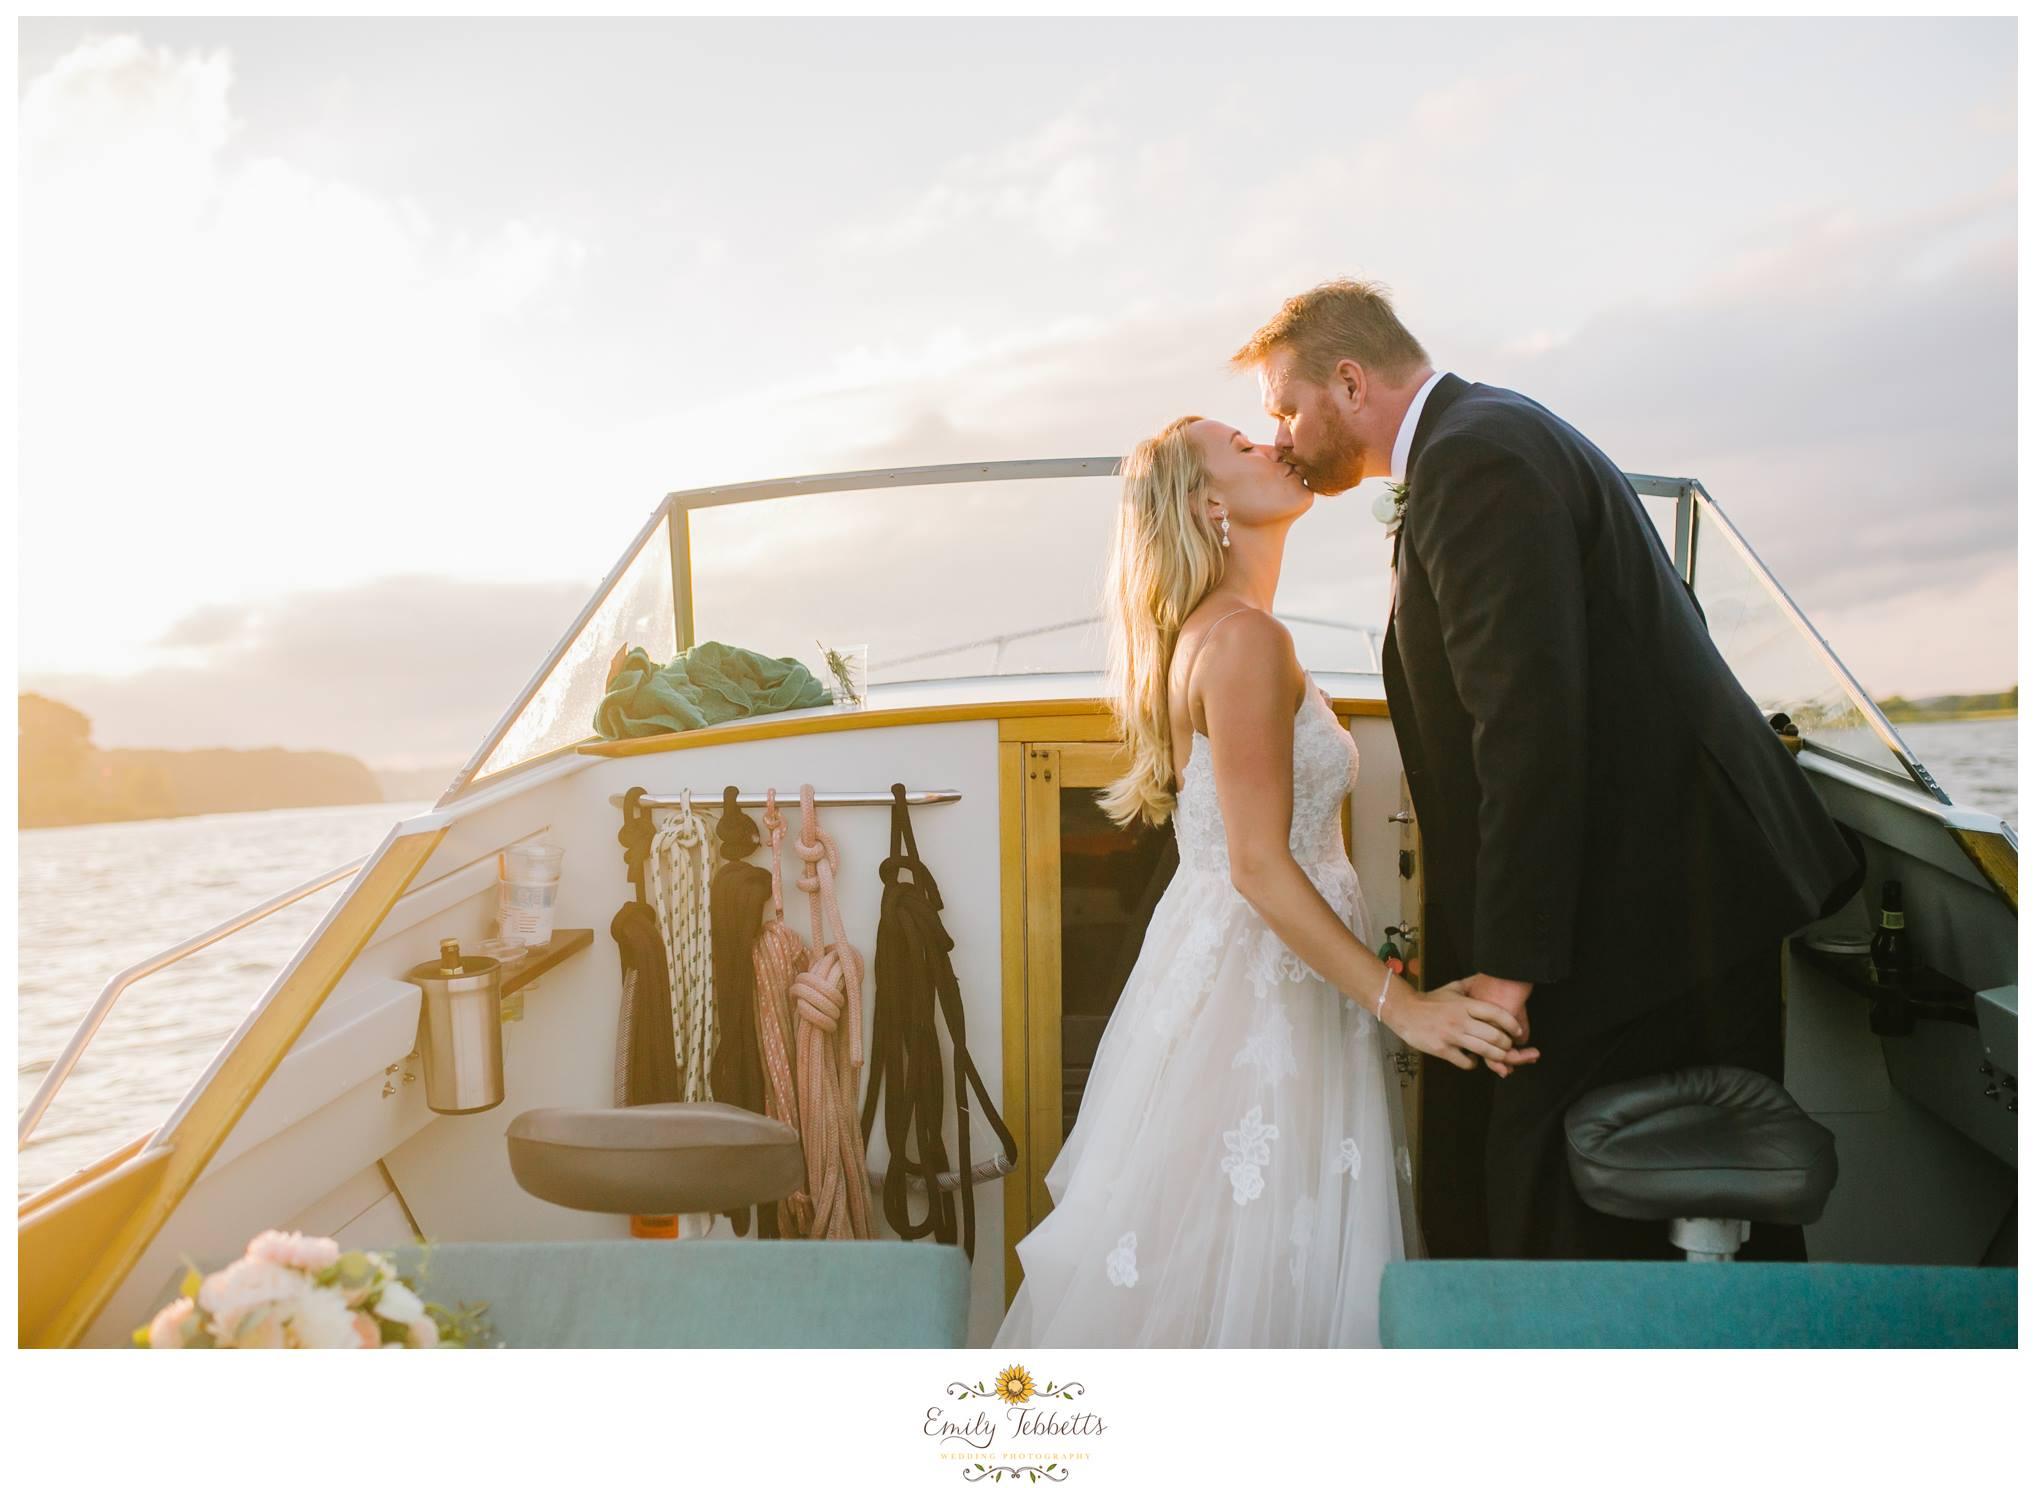 Emily Tebbetts Photography Wedding || Private Residence : Dauntless Club, Essex, CT 1.jpg